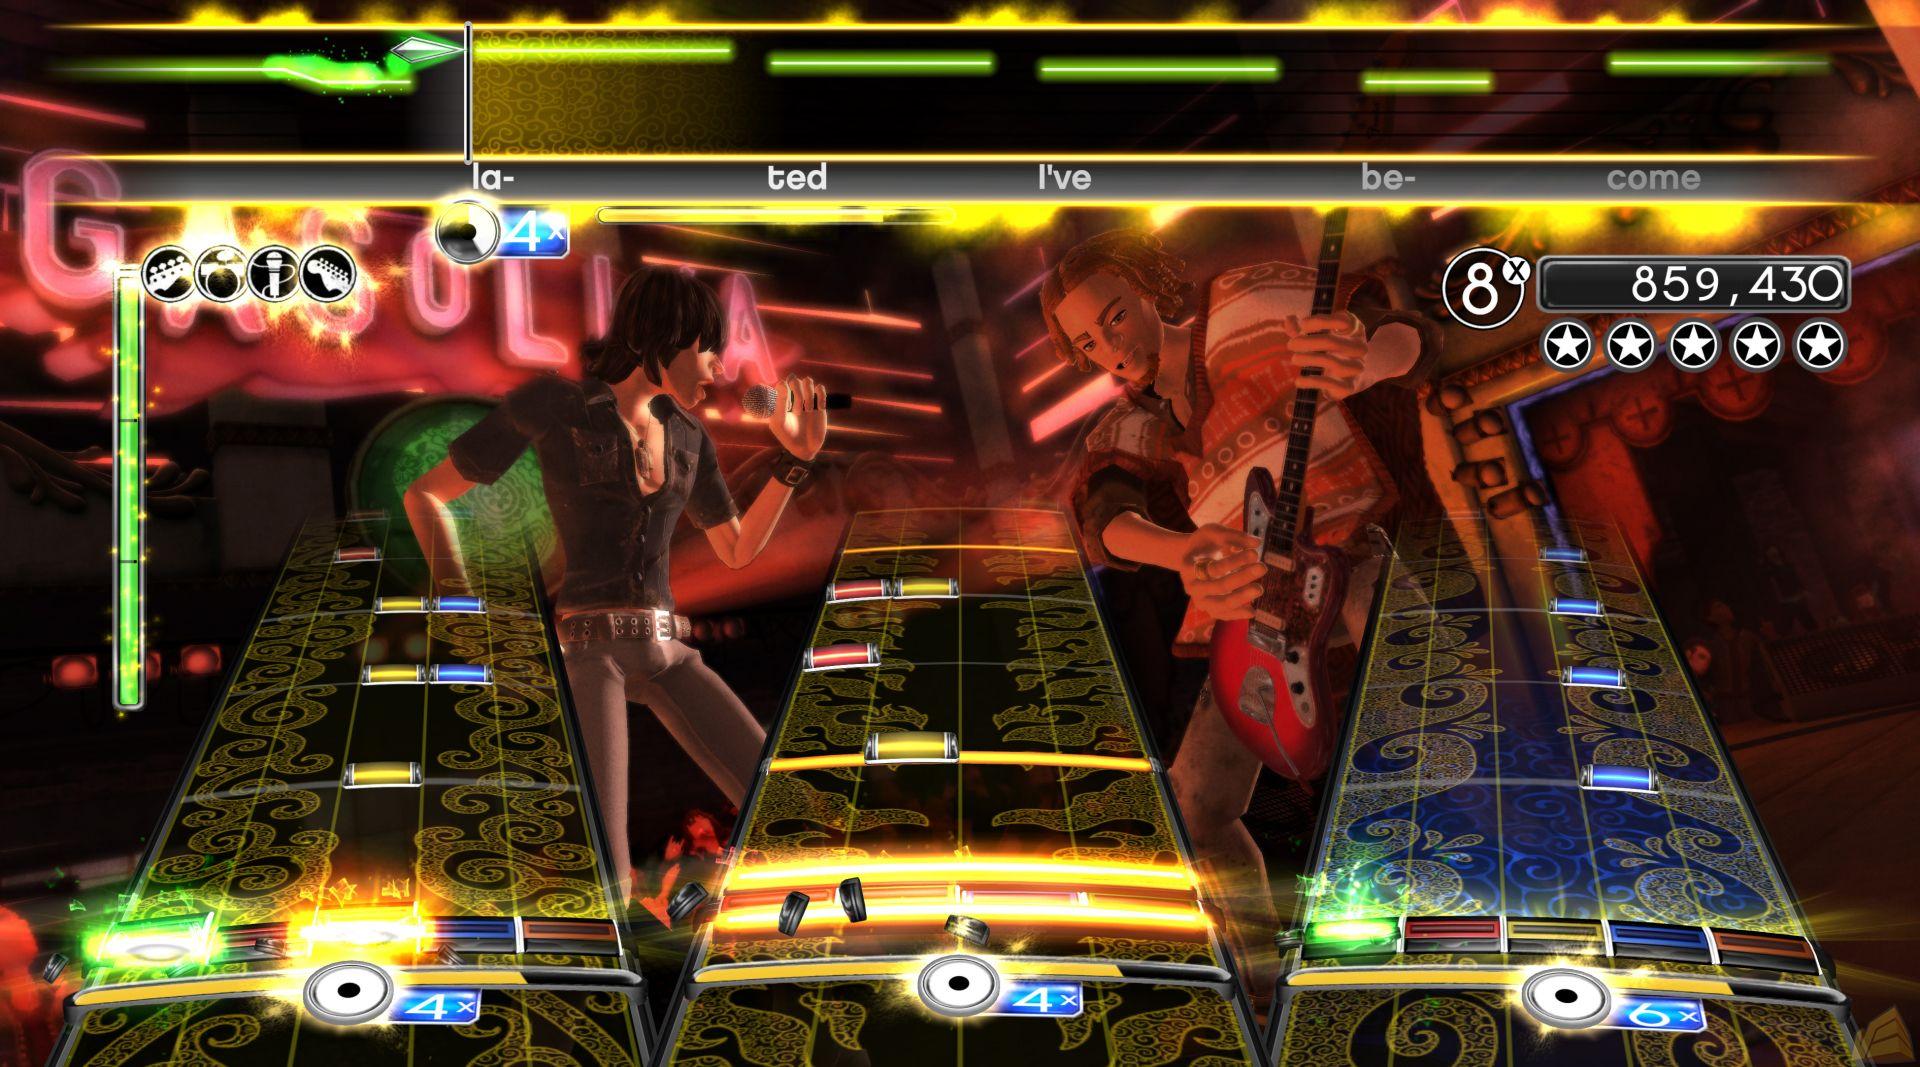 rock-band-2-screenshot-1